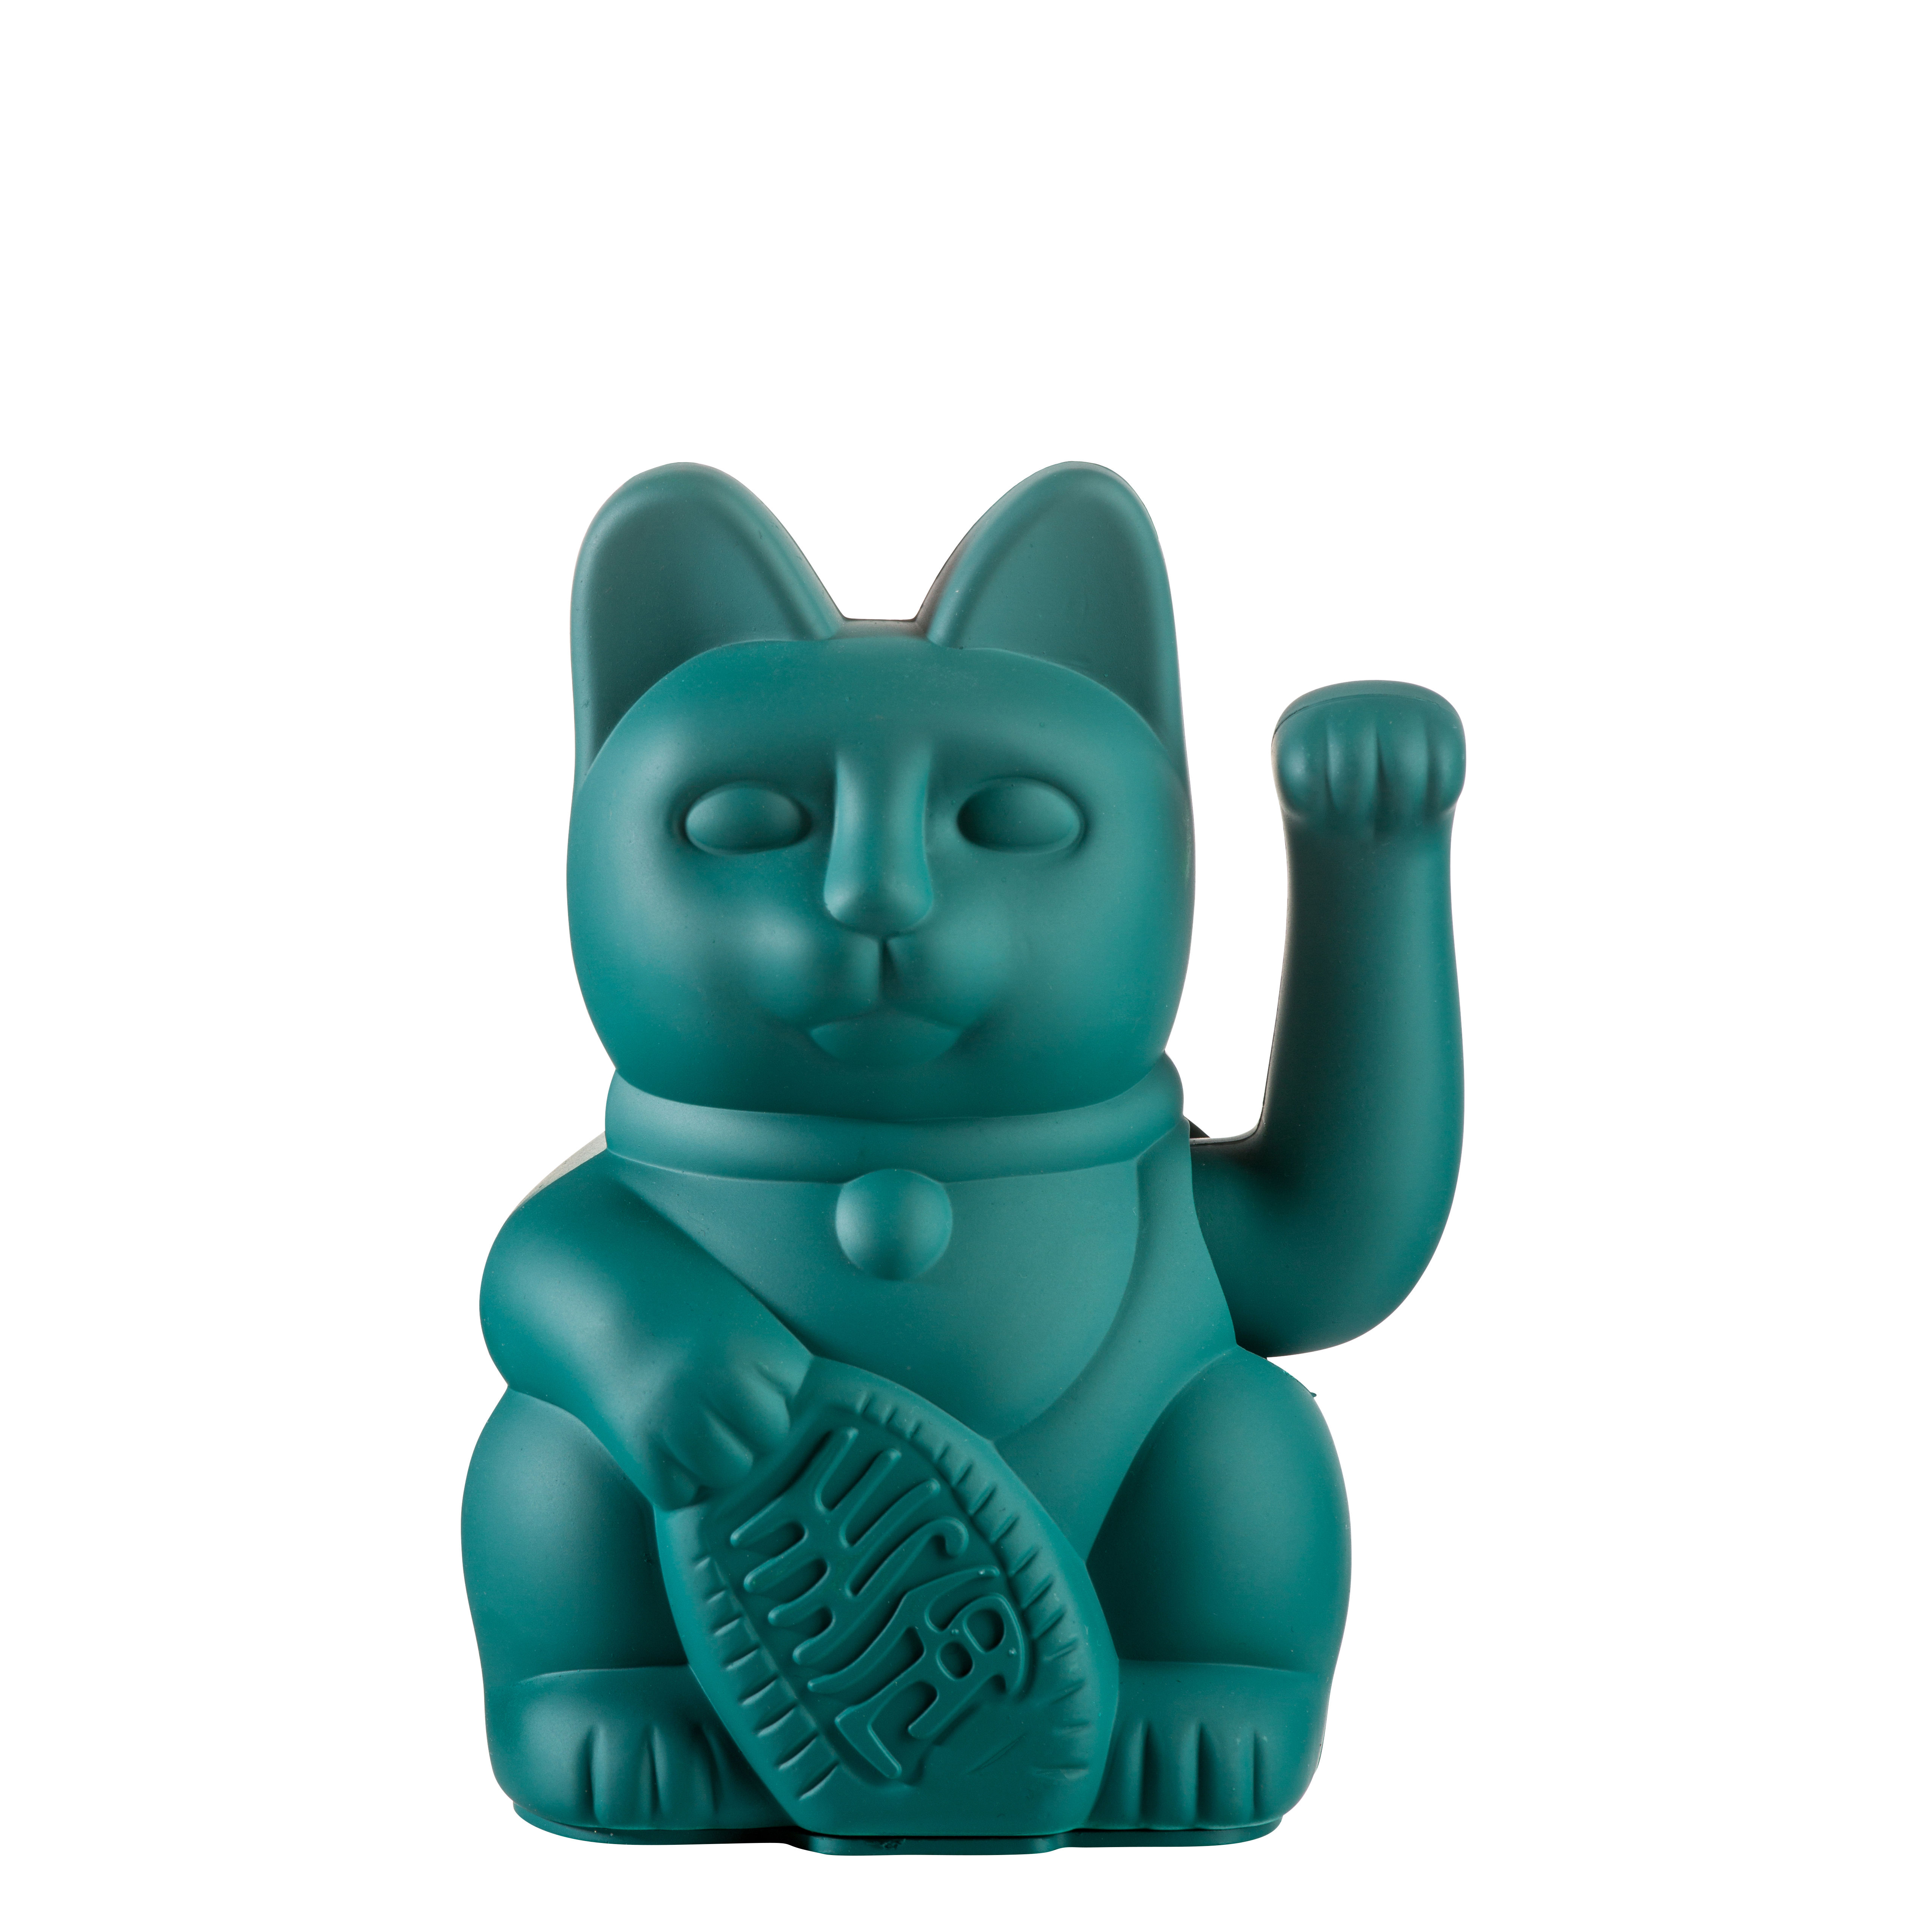 Interni - Per bambini - Figurina Lucky Cat - / Plastica di Donkey - Verde - Plastica